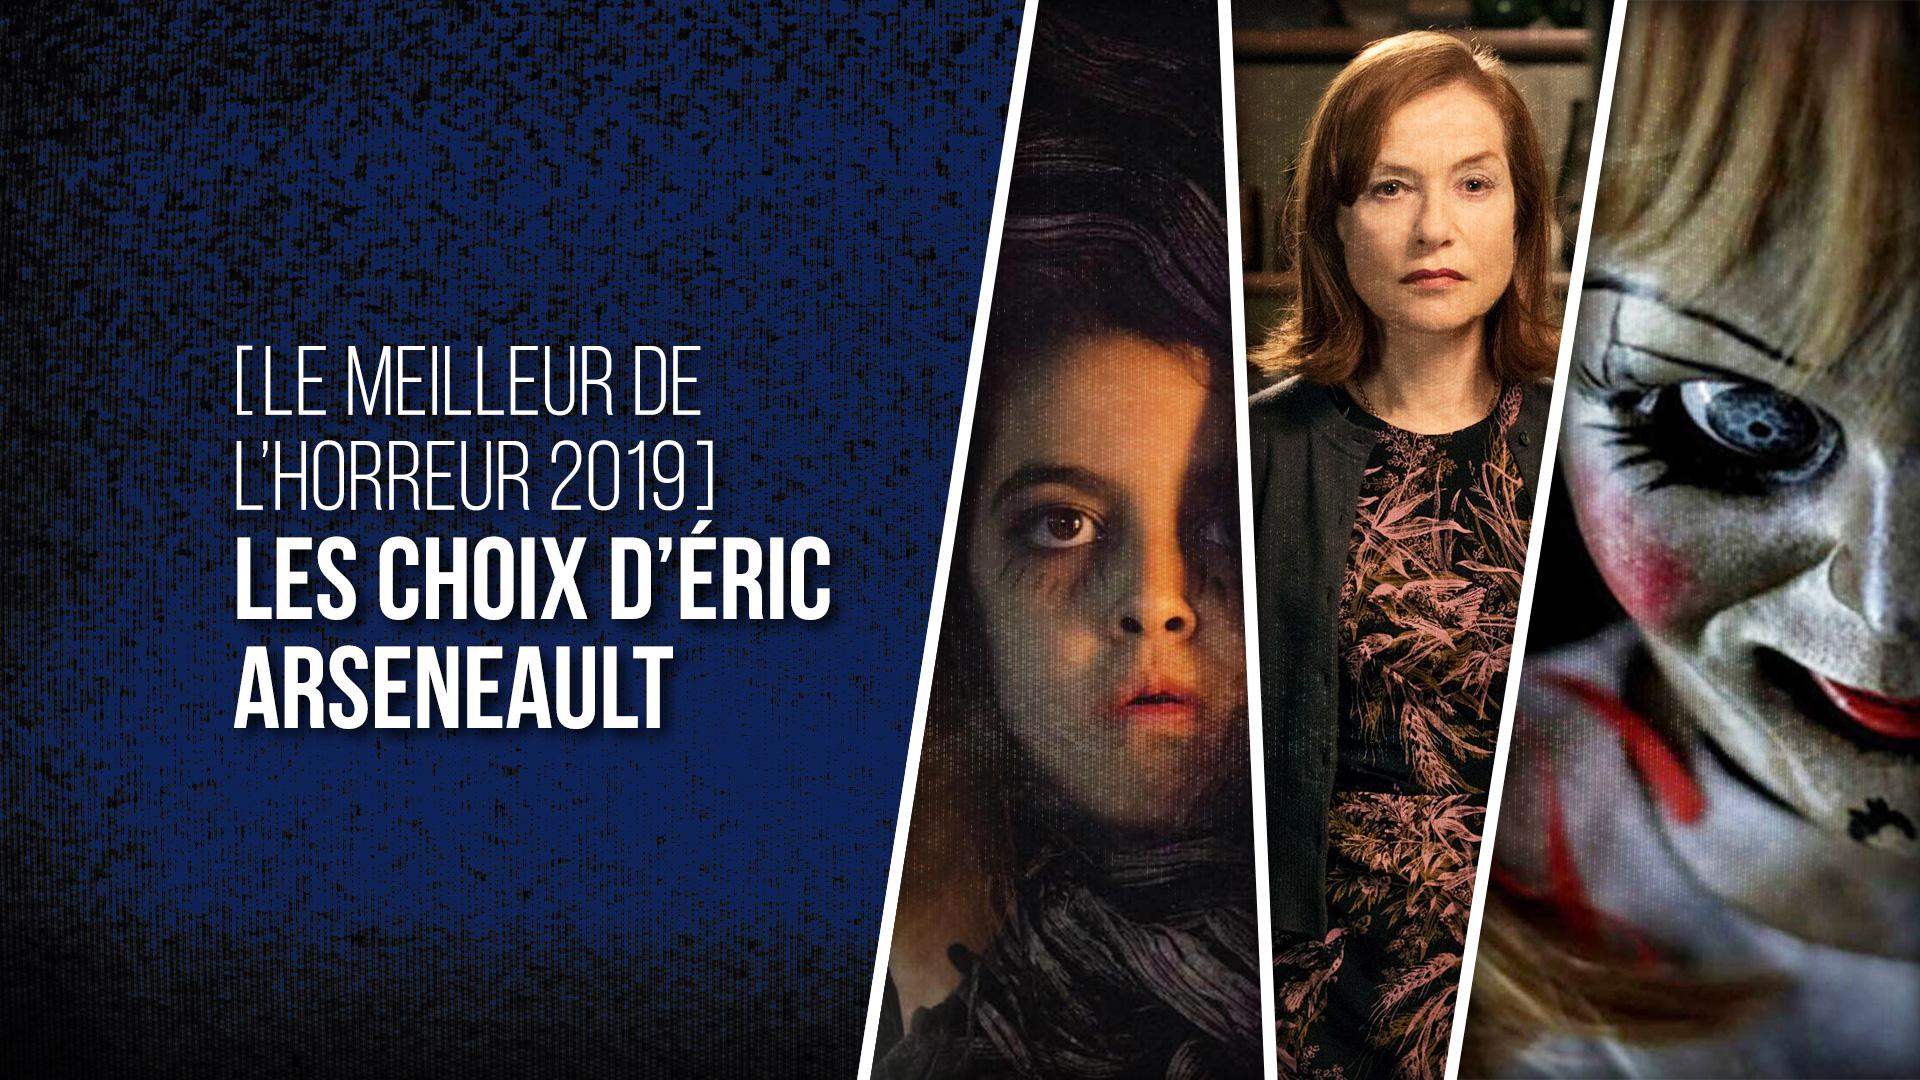 Choix Éric Arseneault 2019